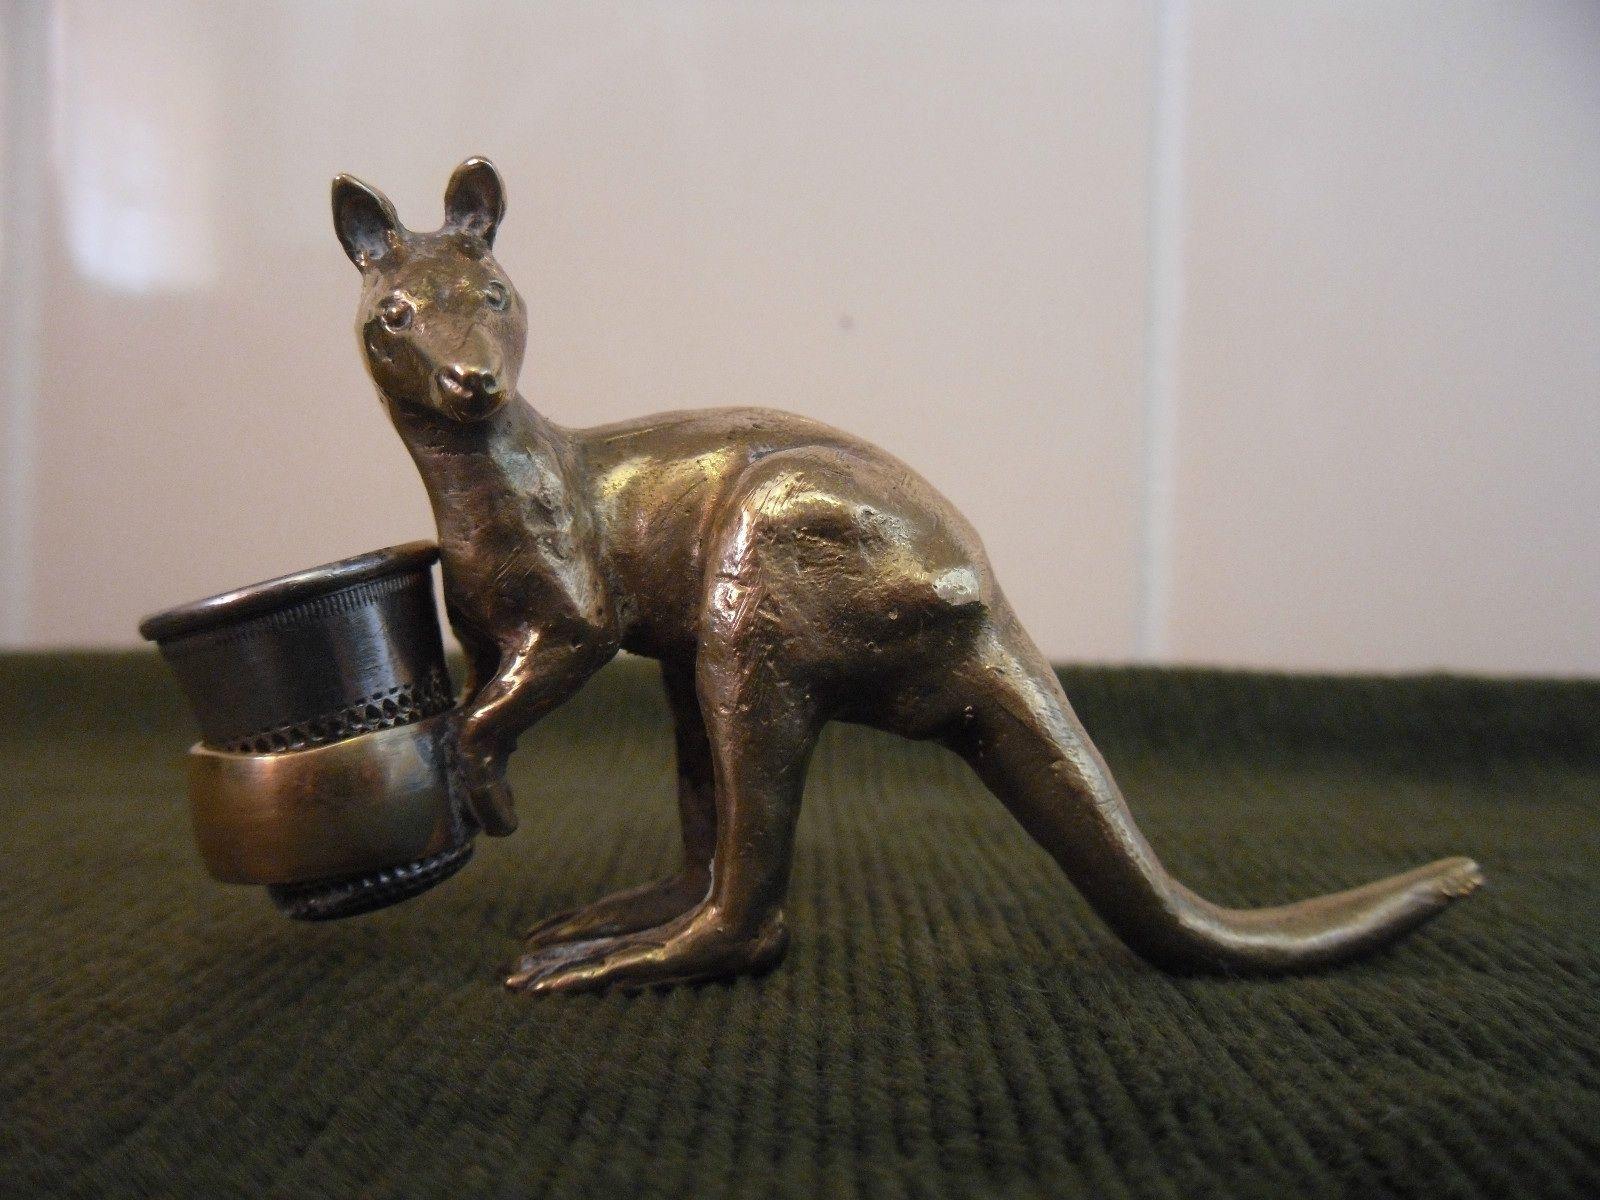 Kangaroo thimble holder